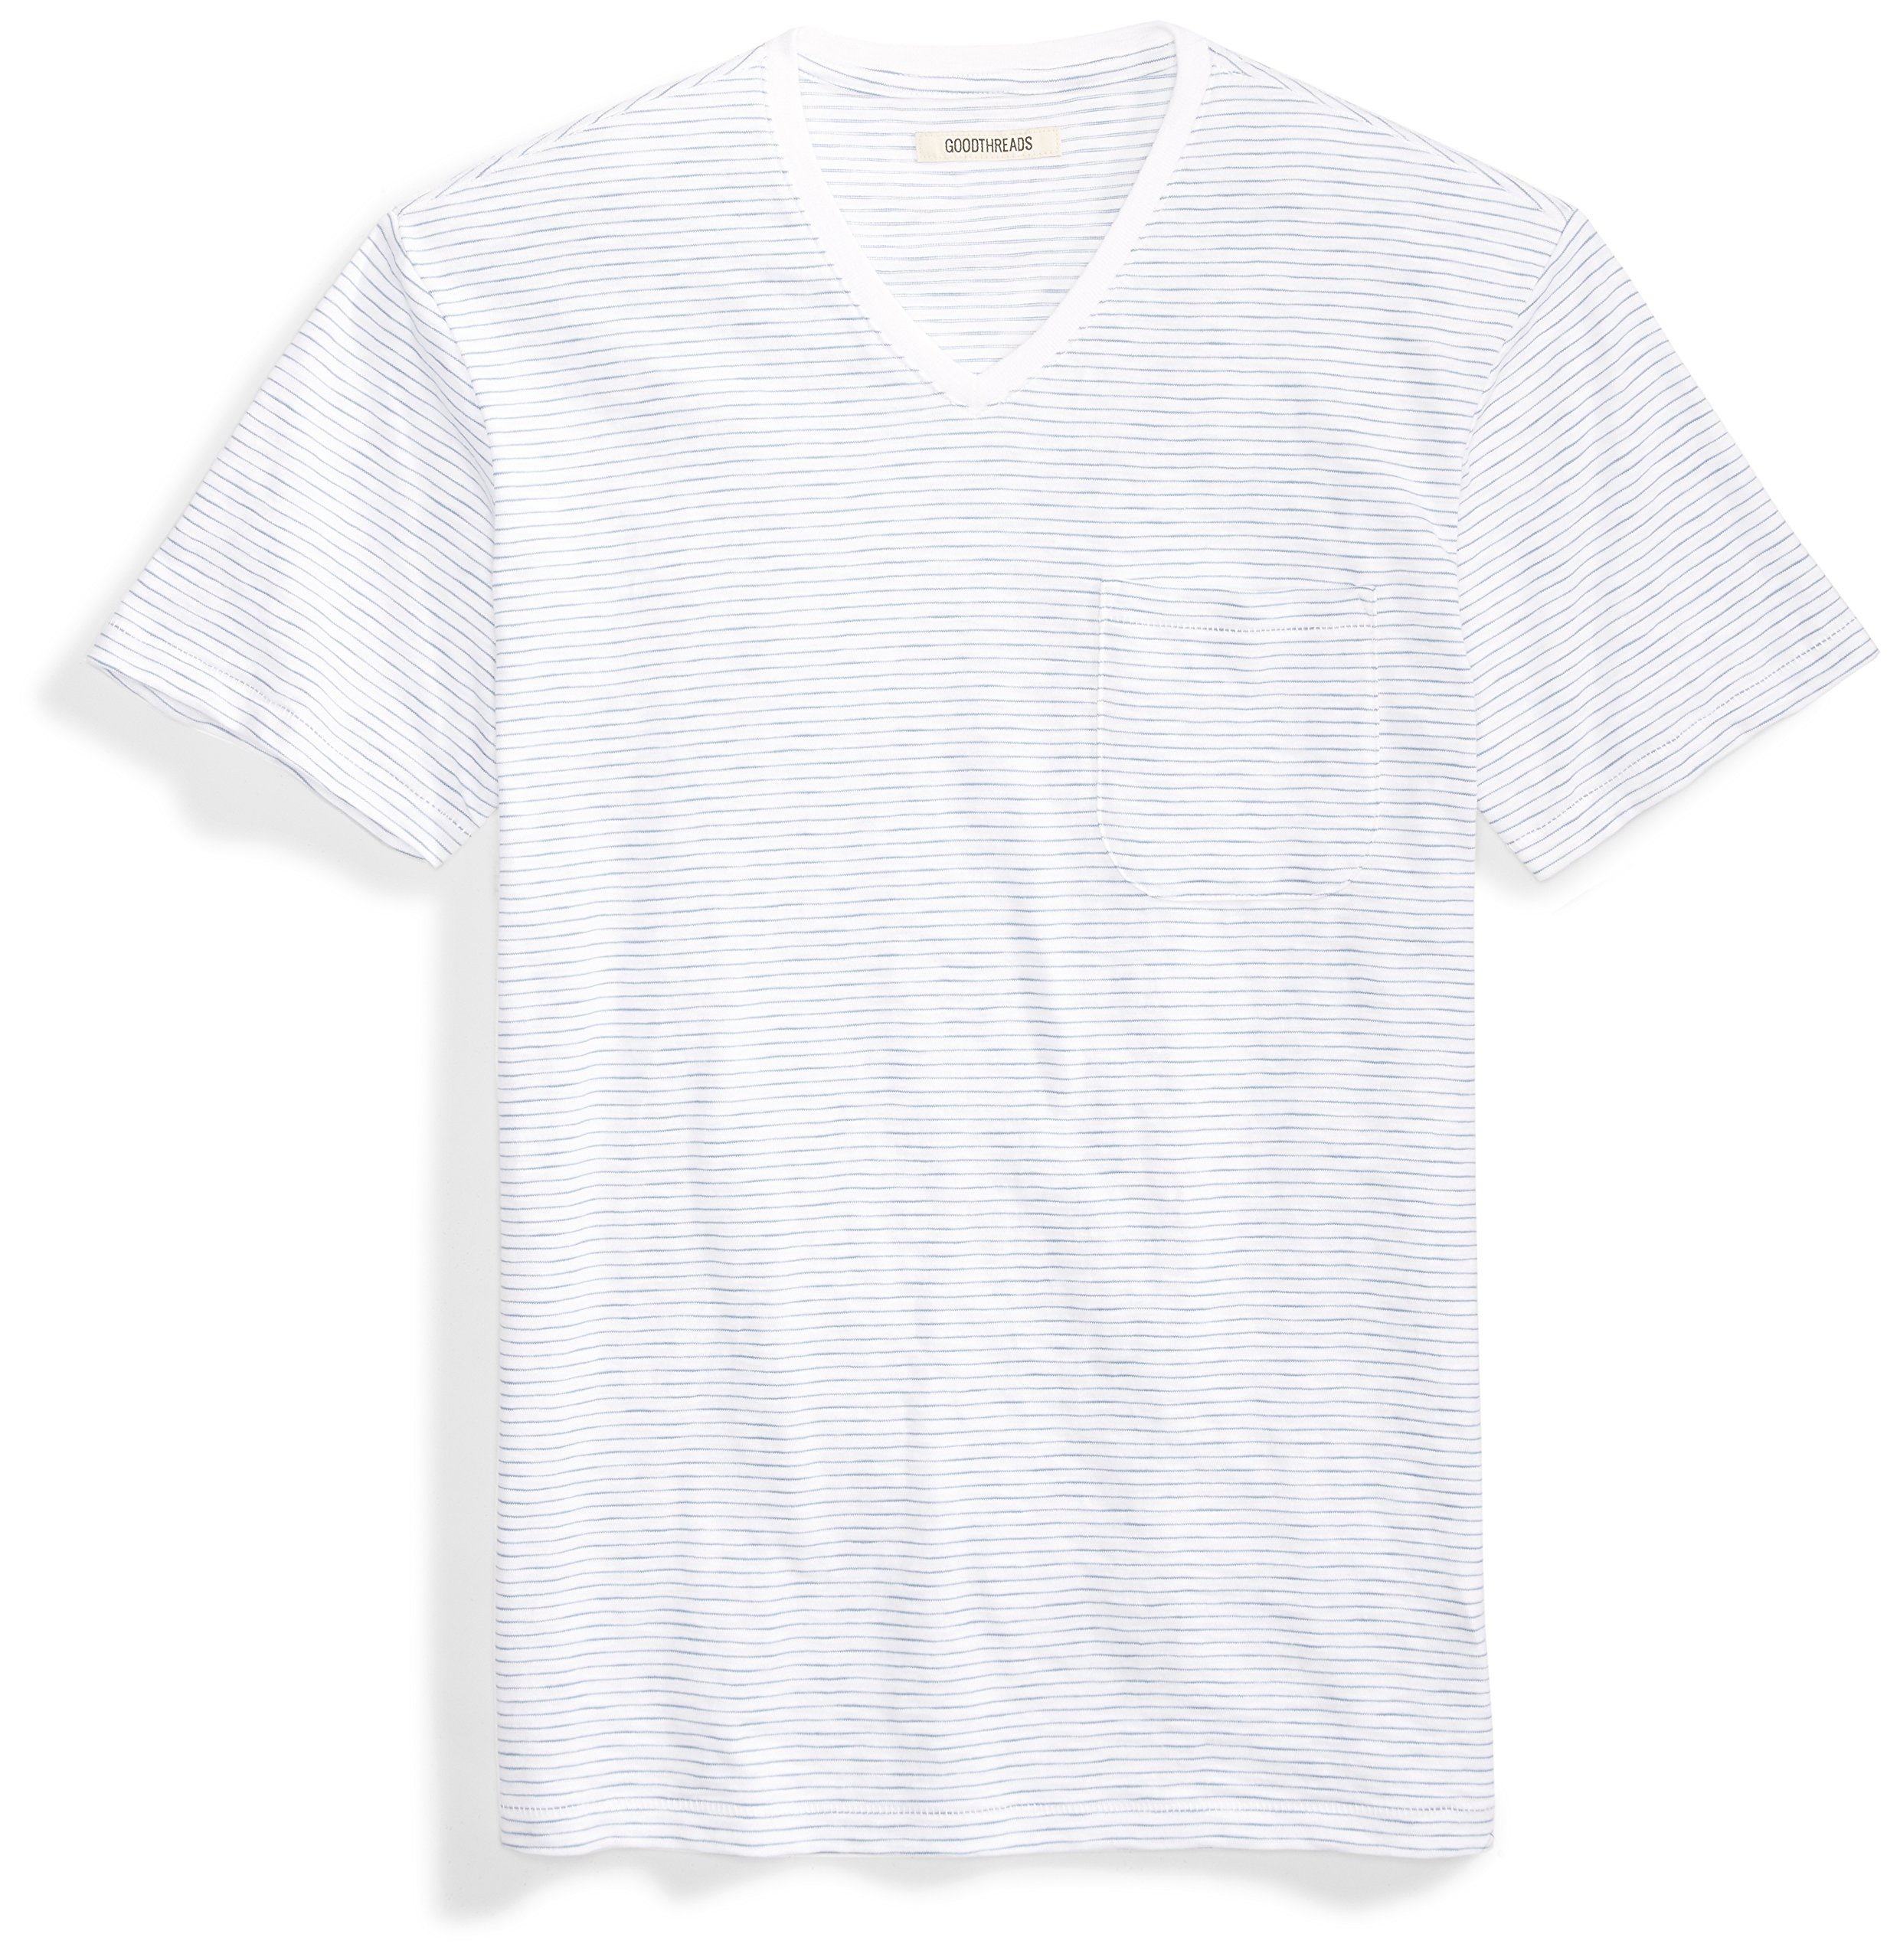 Goodthreads Men's Short-Sleeve V-Neck Striped Slub Pocket T-Shirt, Bright White/Blue Stripe, Large